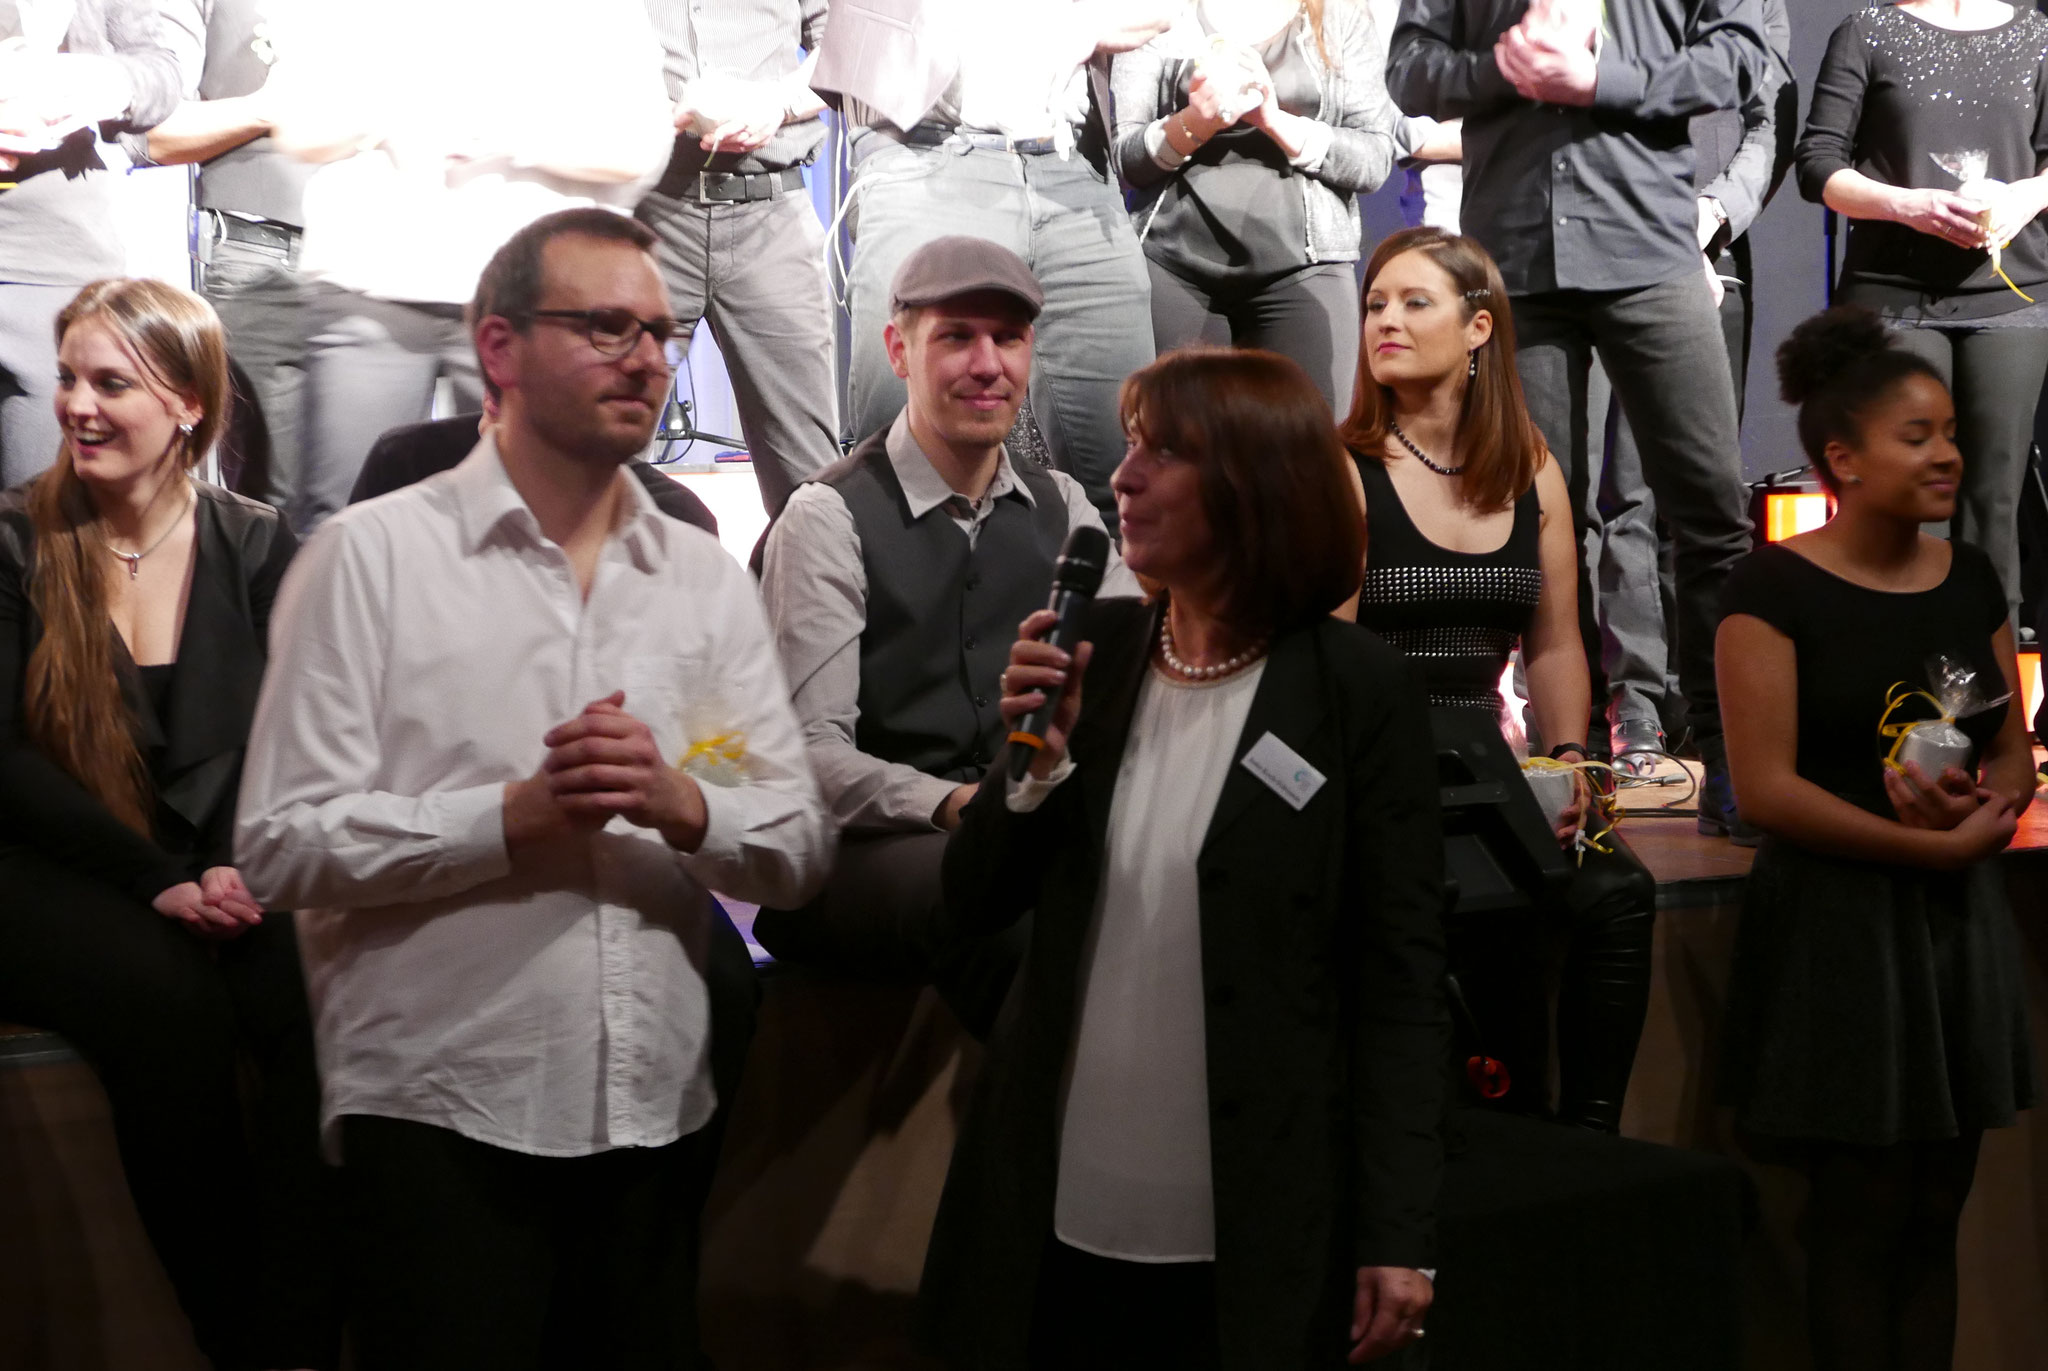 Benefizkonzert zugunsten des Freiwilligen-Zentrum Augsburg Greg is Back - A Cappela XXL Sonntag, 5. Februar 2017 im Barbarasaal - Foto: Christoph Urban